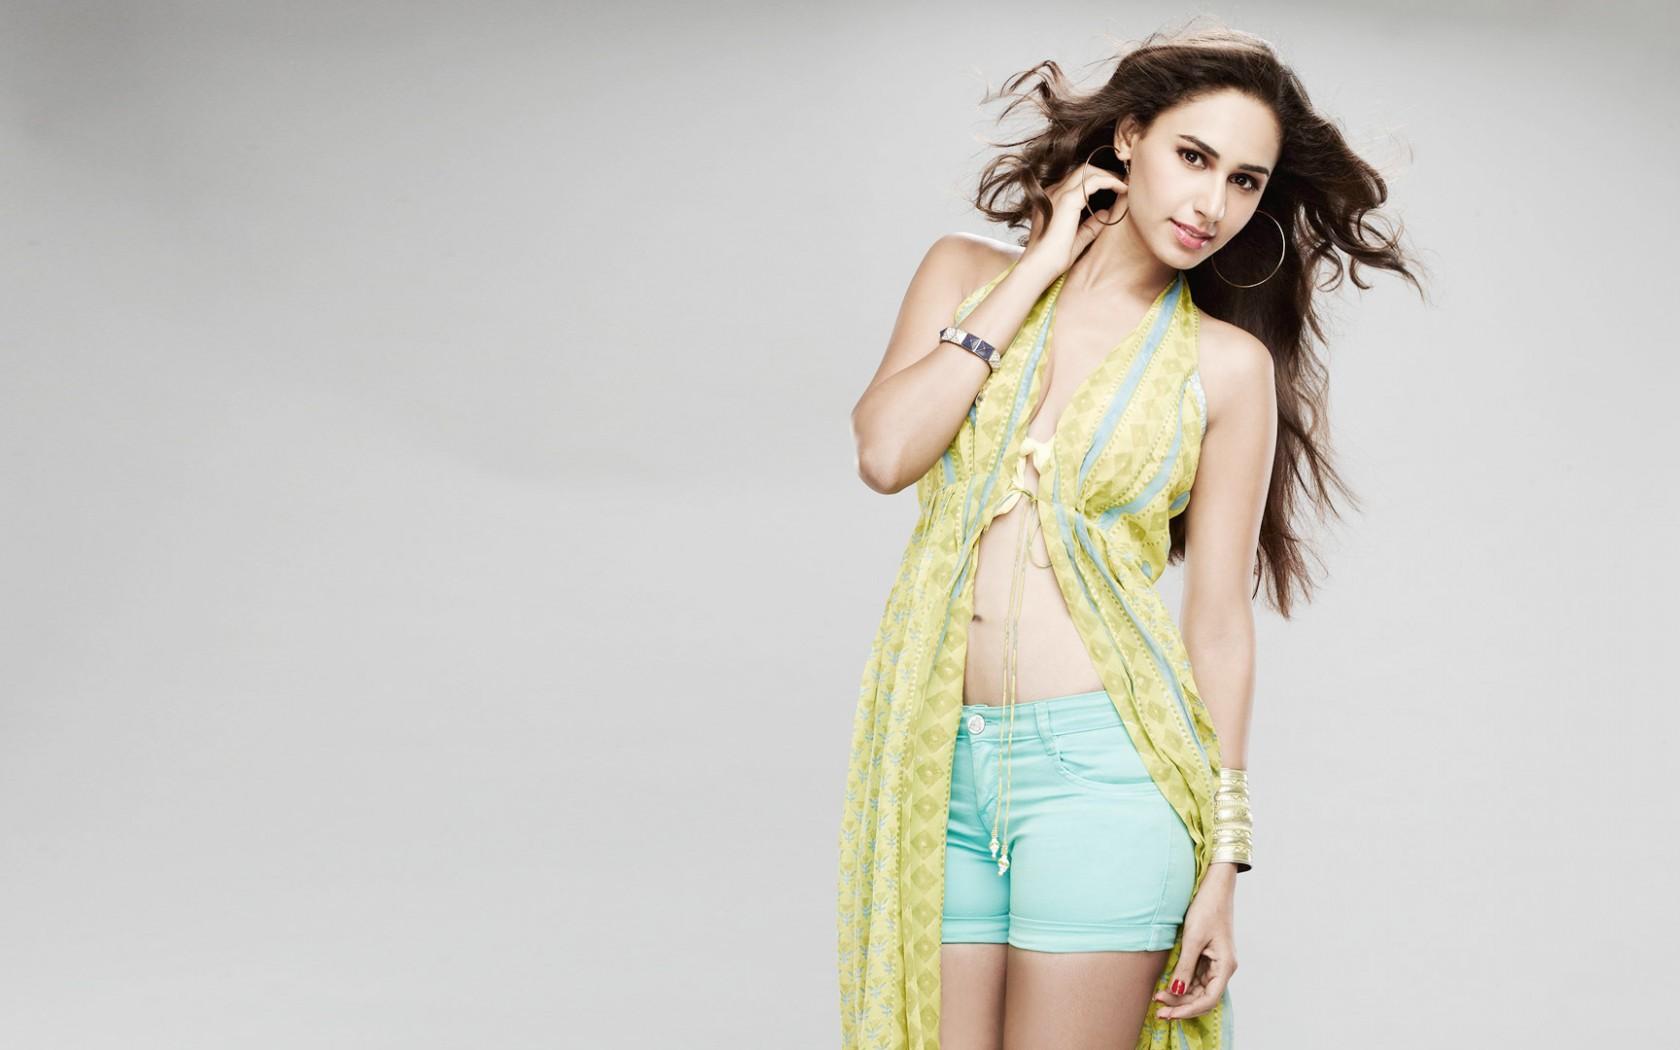 Hasleen Kaur Indian Model Wallpaper